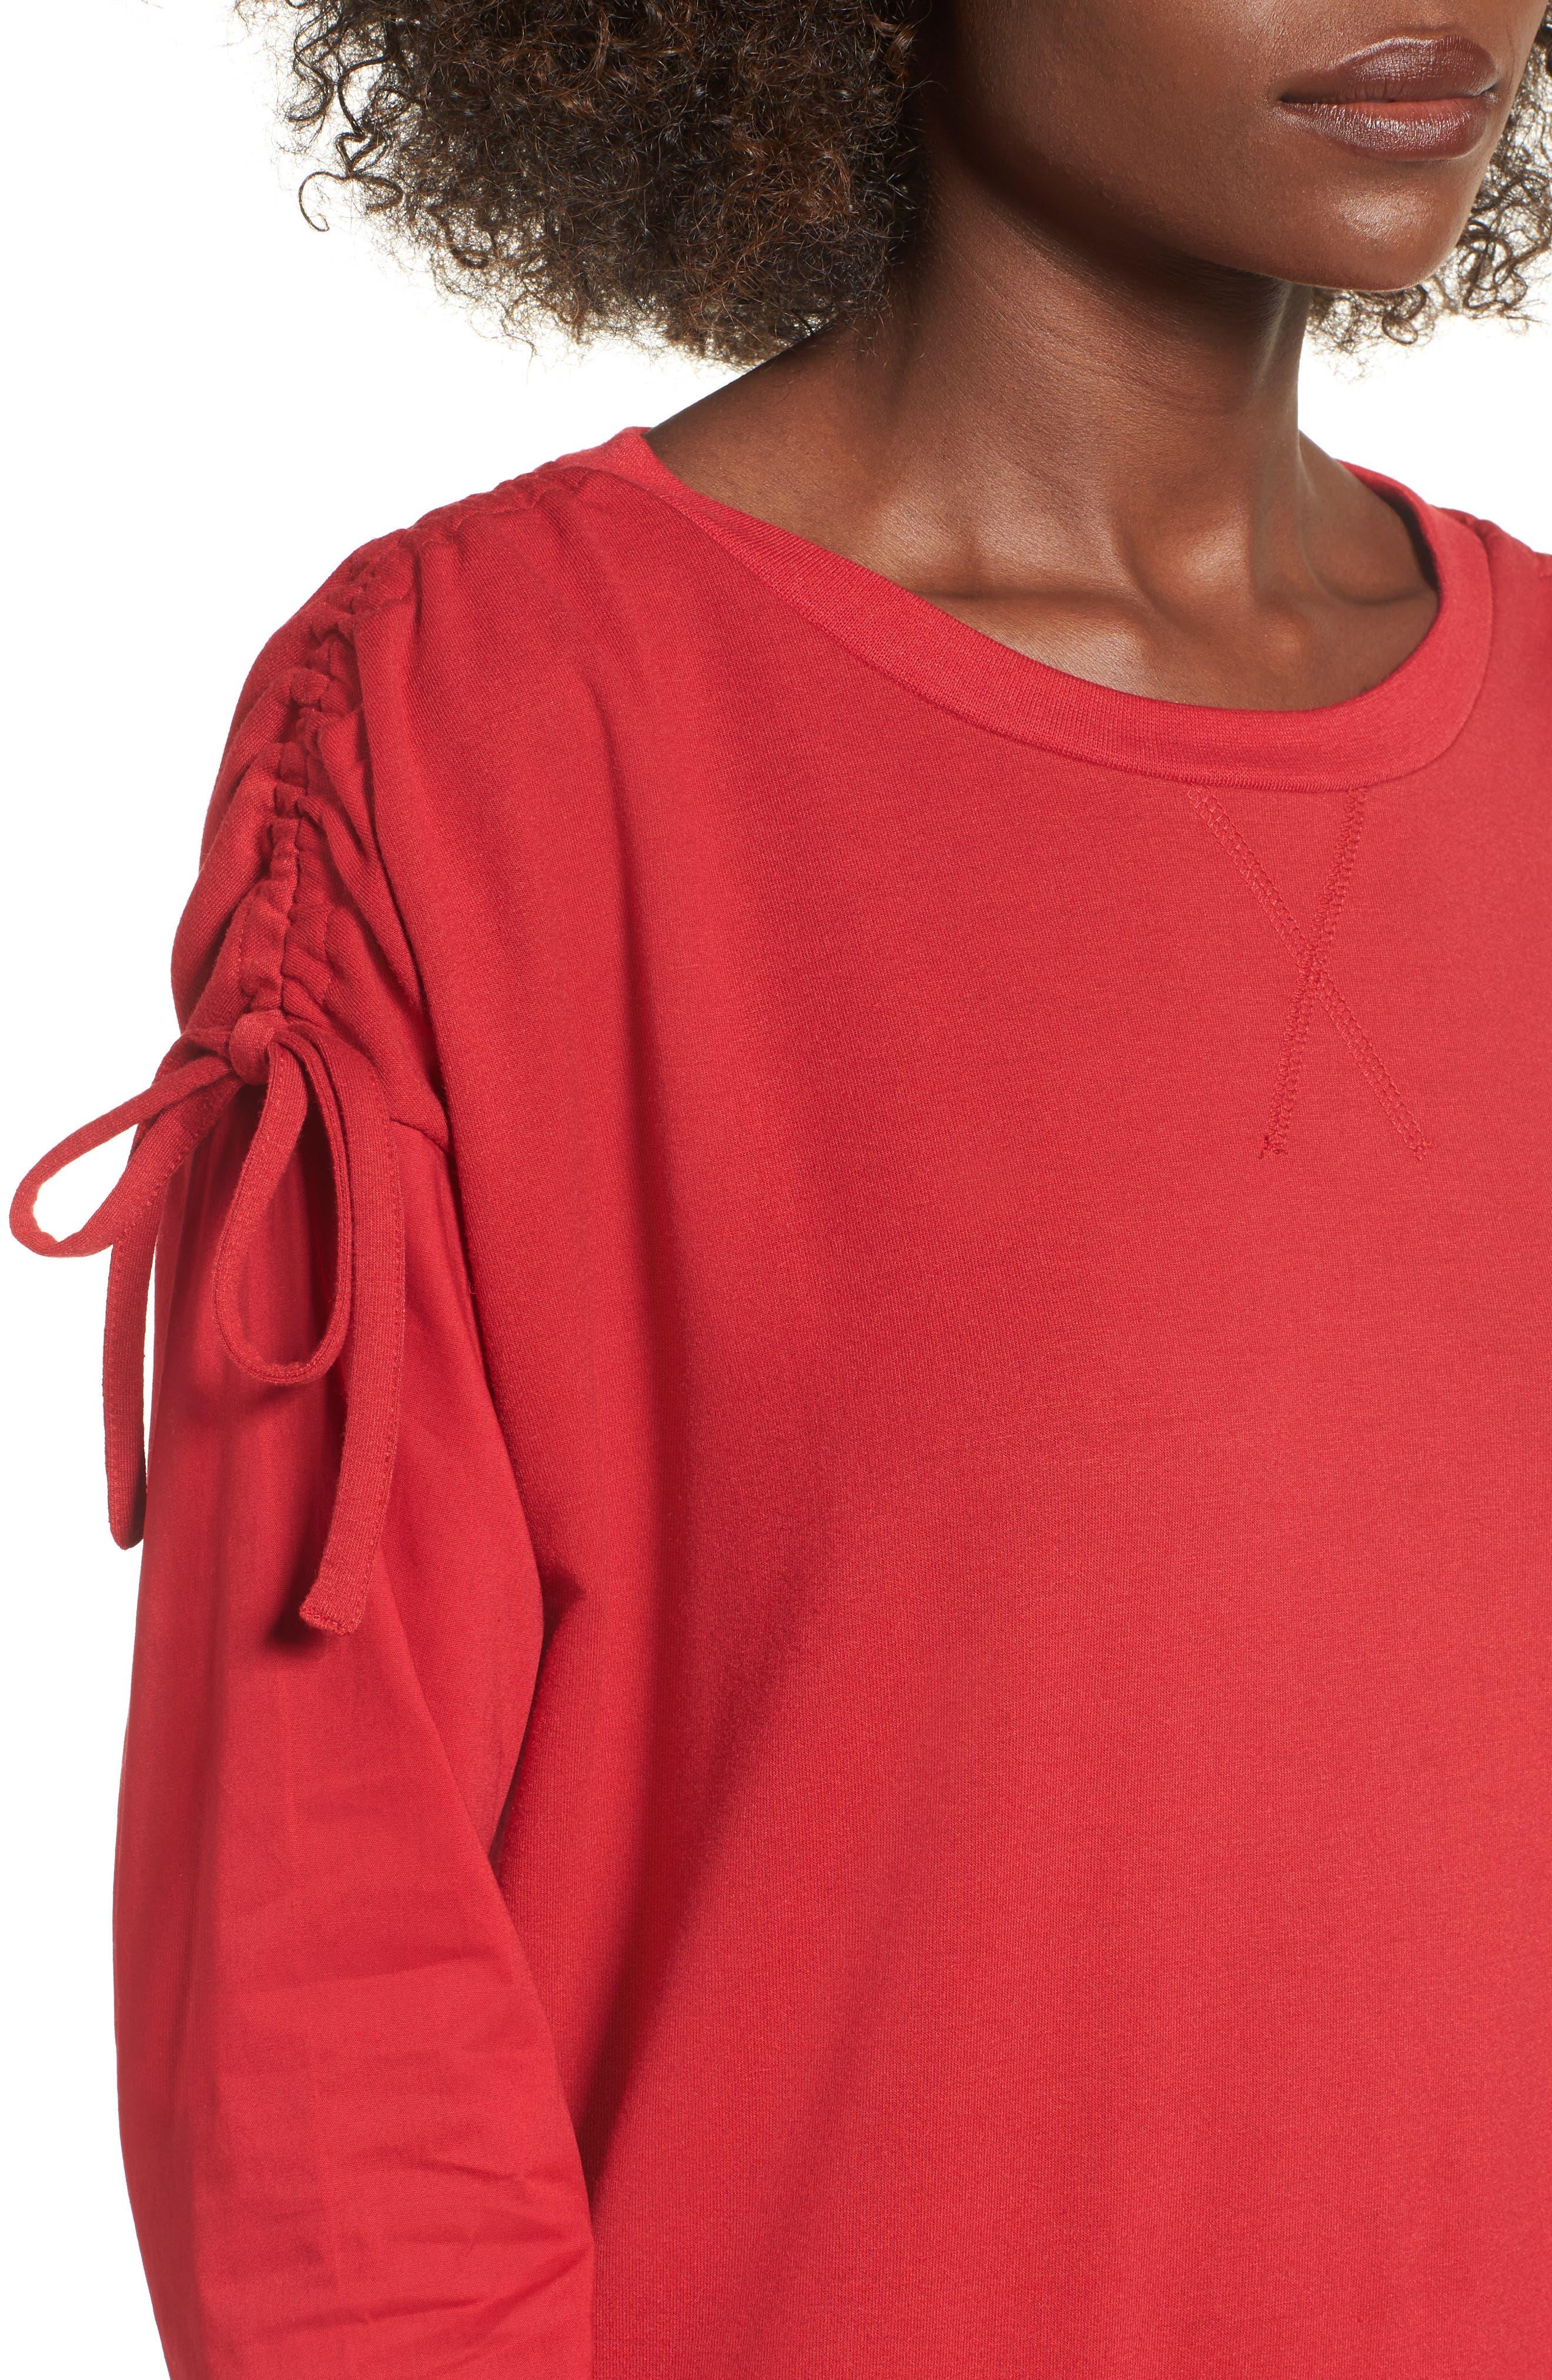 Cinch Sleeve Sweatshirt,                             Alternate thumbnail 4, color,                             603